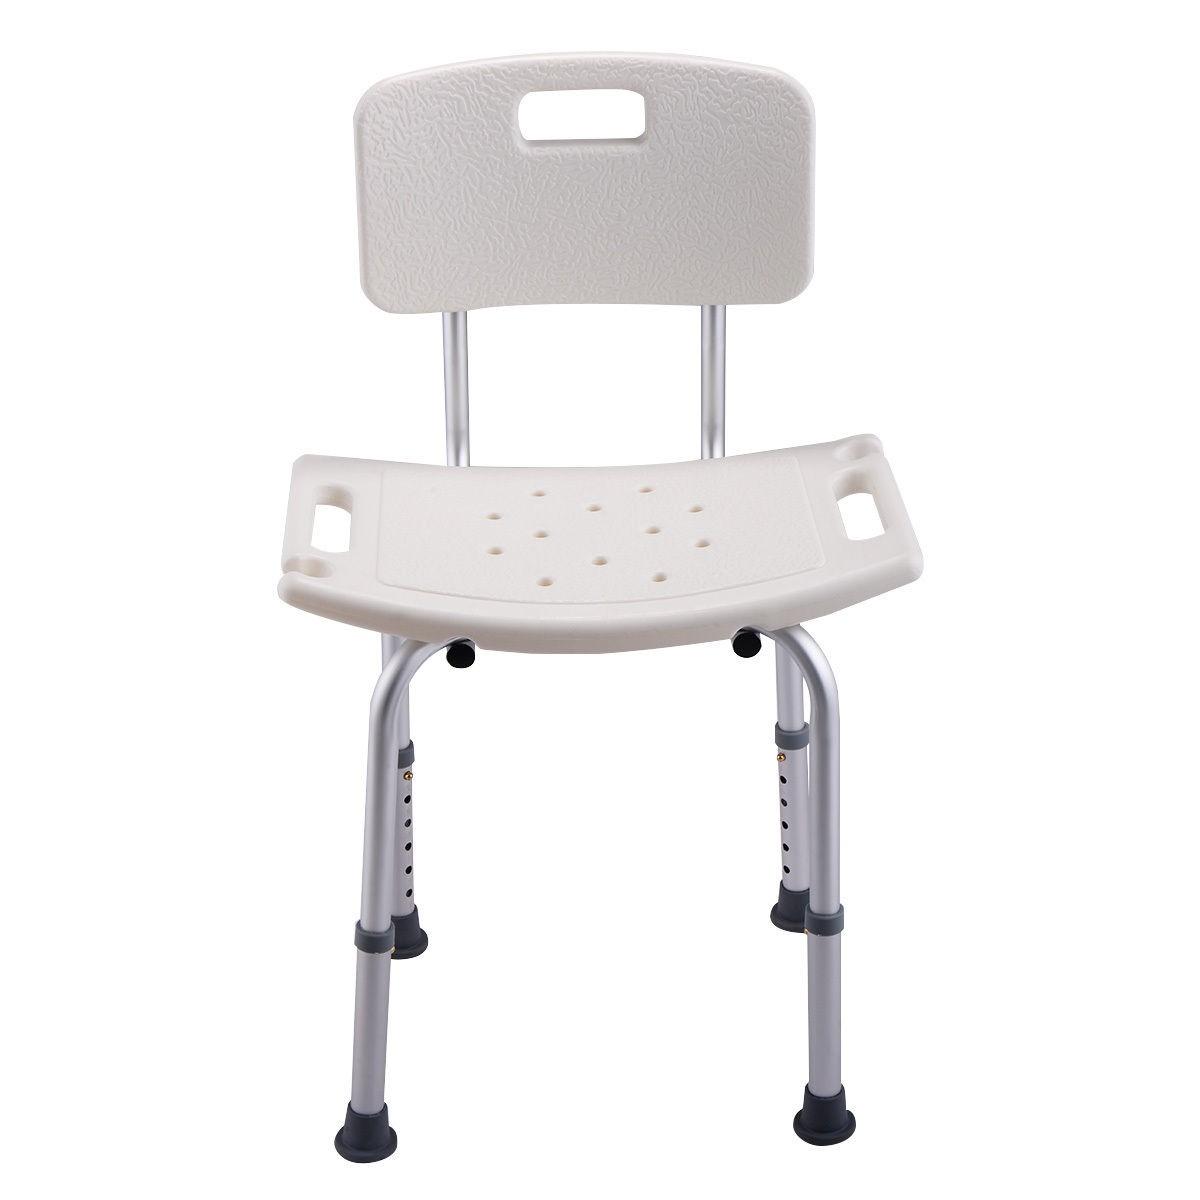 Adjustable 6 height bathroom bath shower chair medical for White bathroom stool